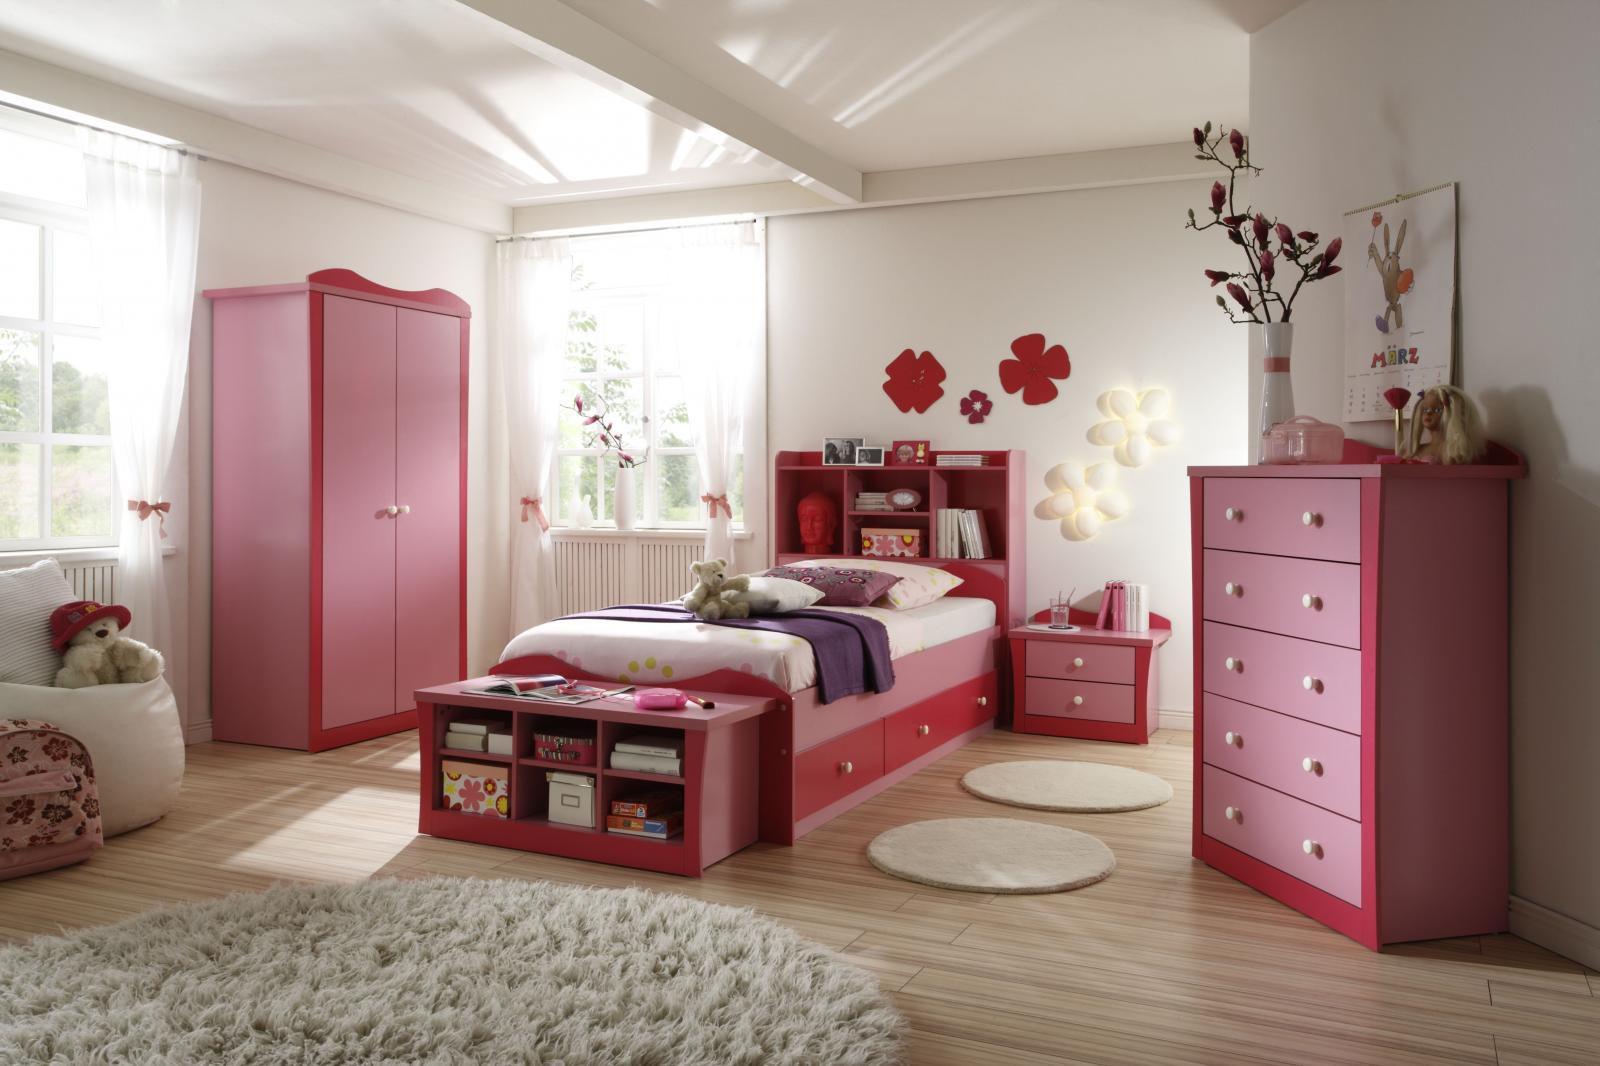 Best Home Interior Design Korean Bedroom Decoration For S